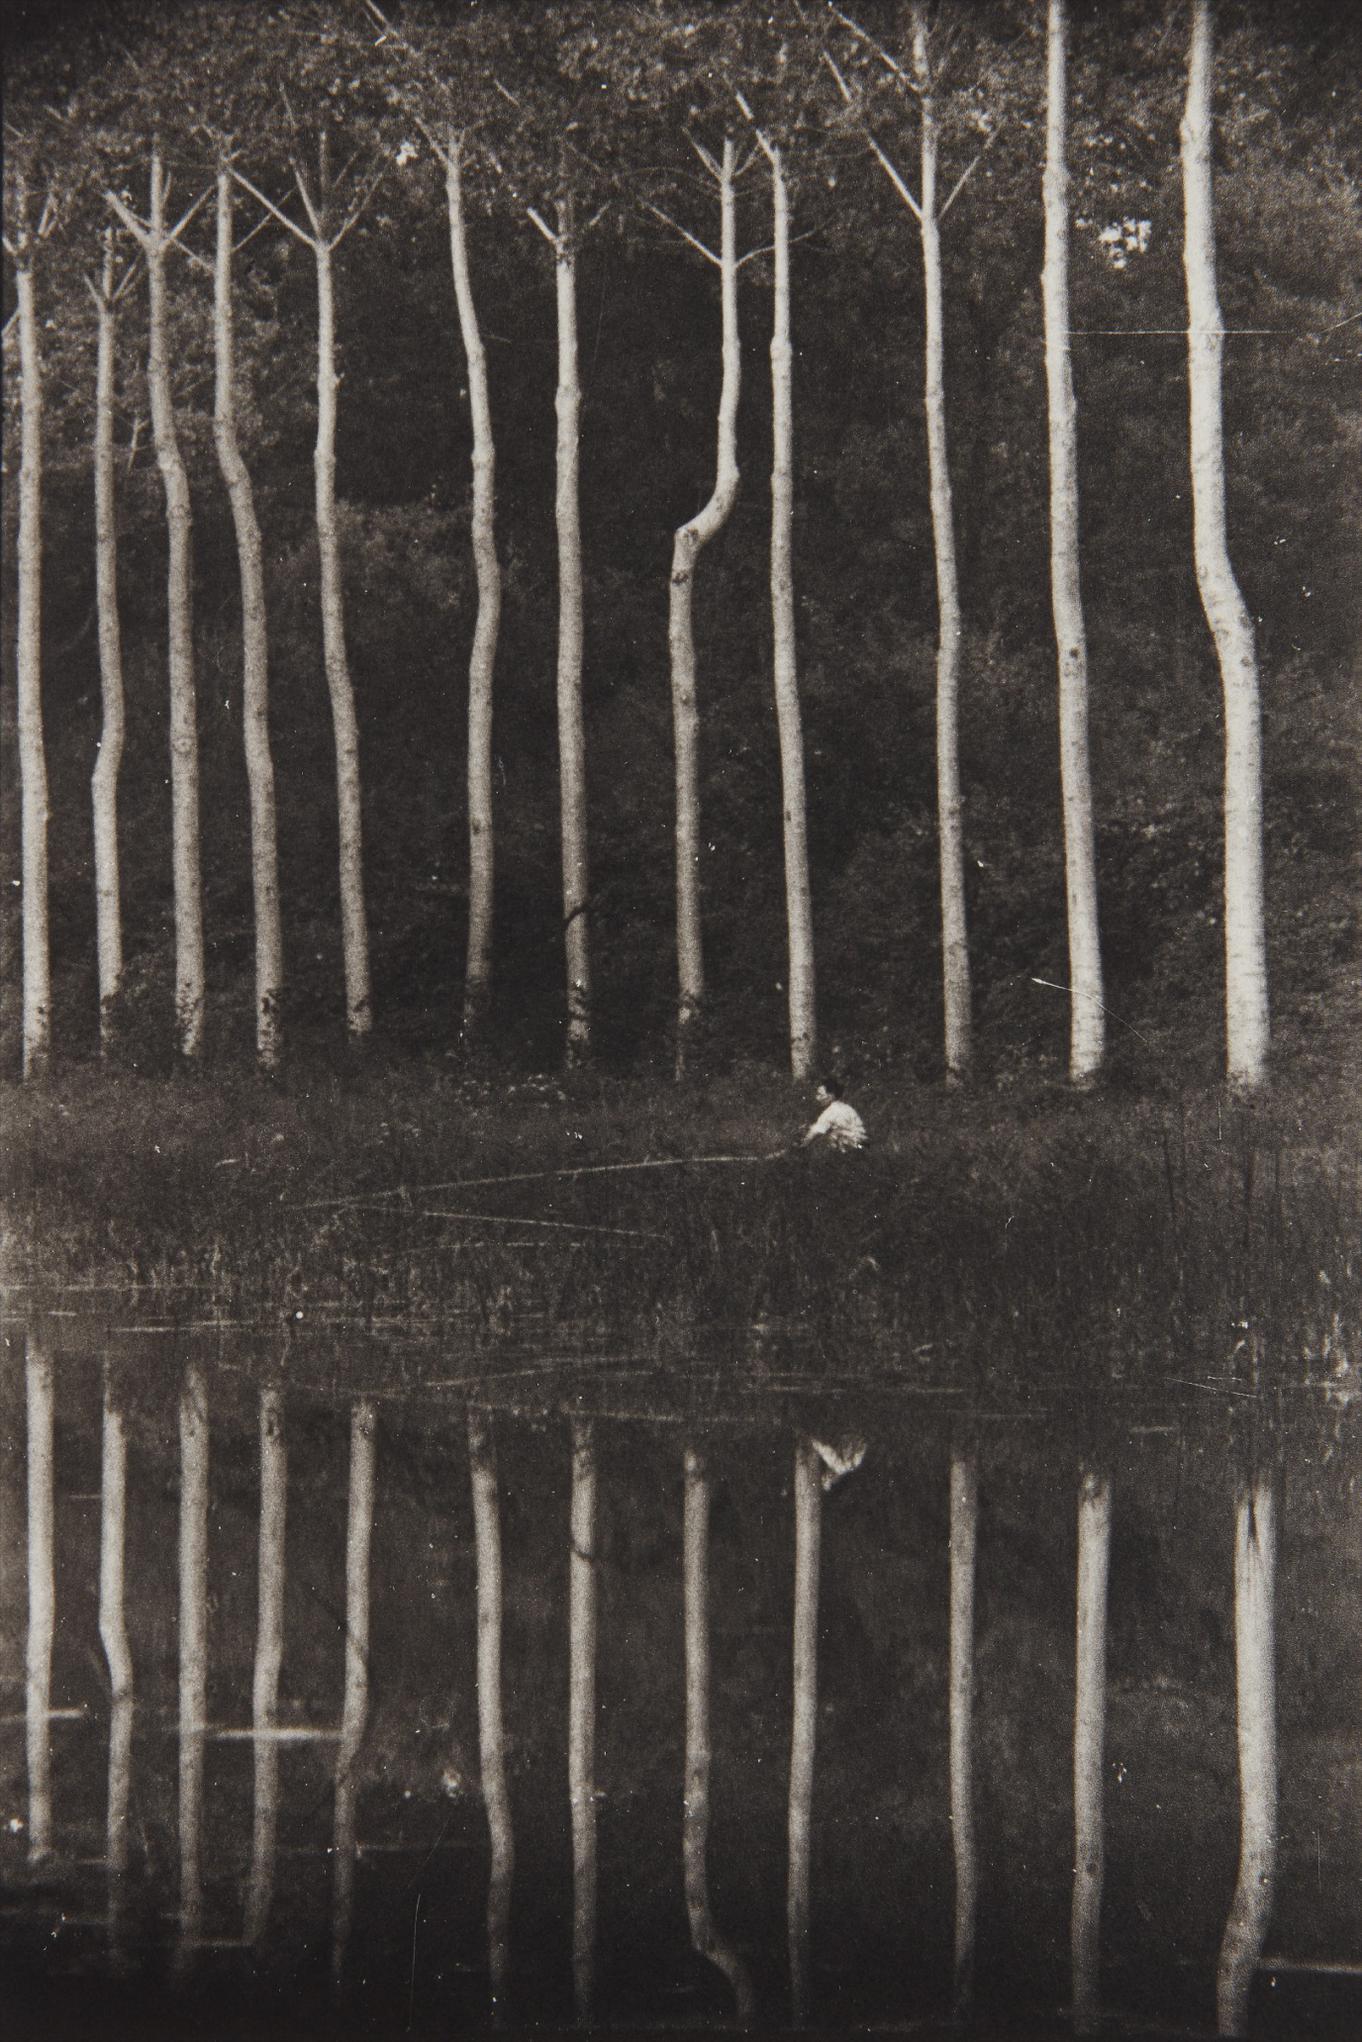 Irving Penn-Man Fishing From Bank Of Seine-1950